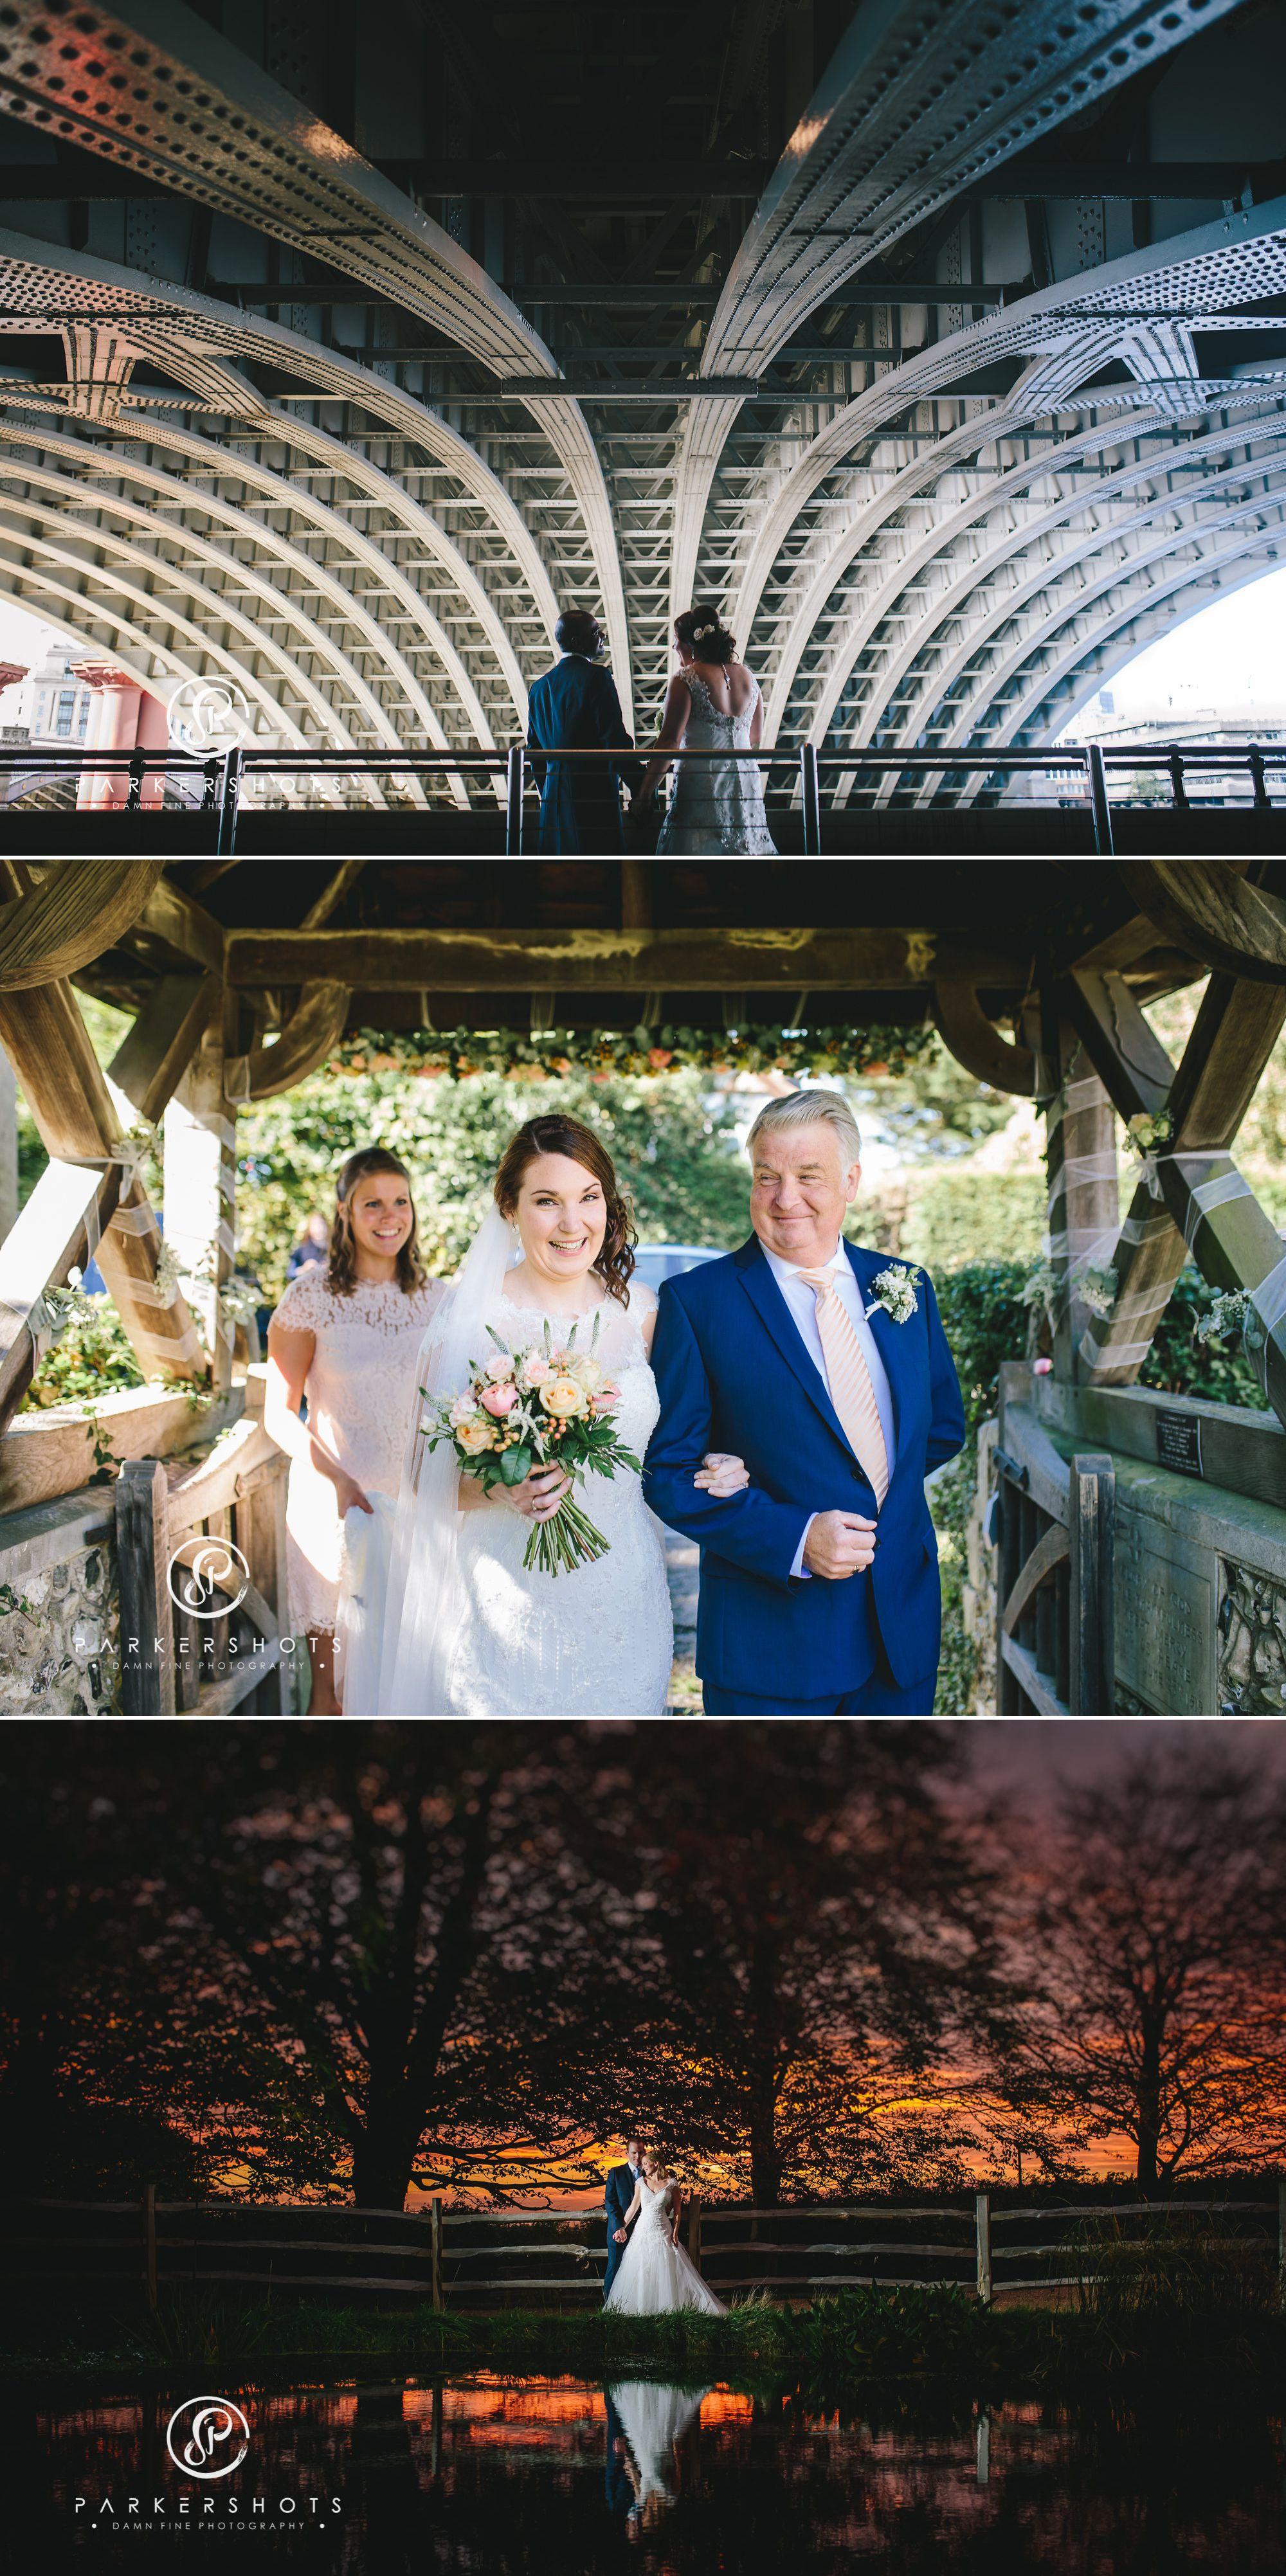 Best_Of_Wedding_Photographer_2015 23